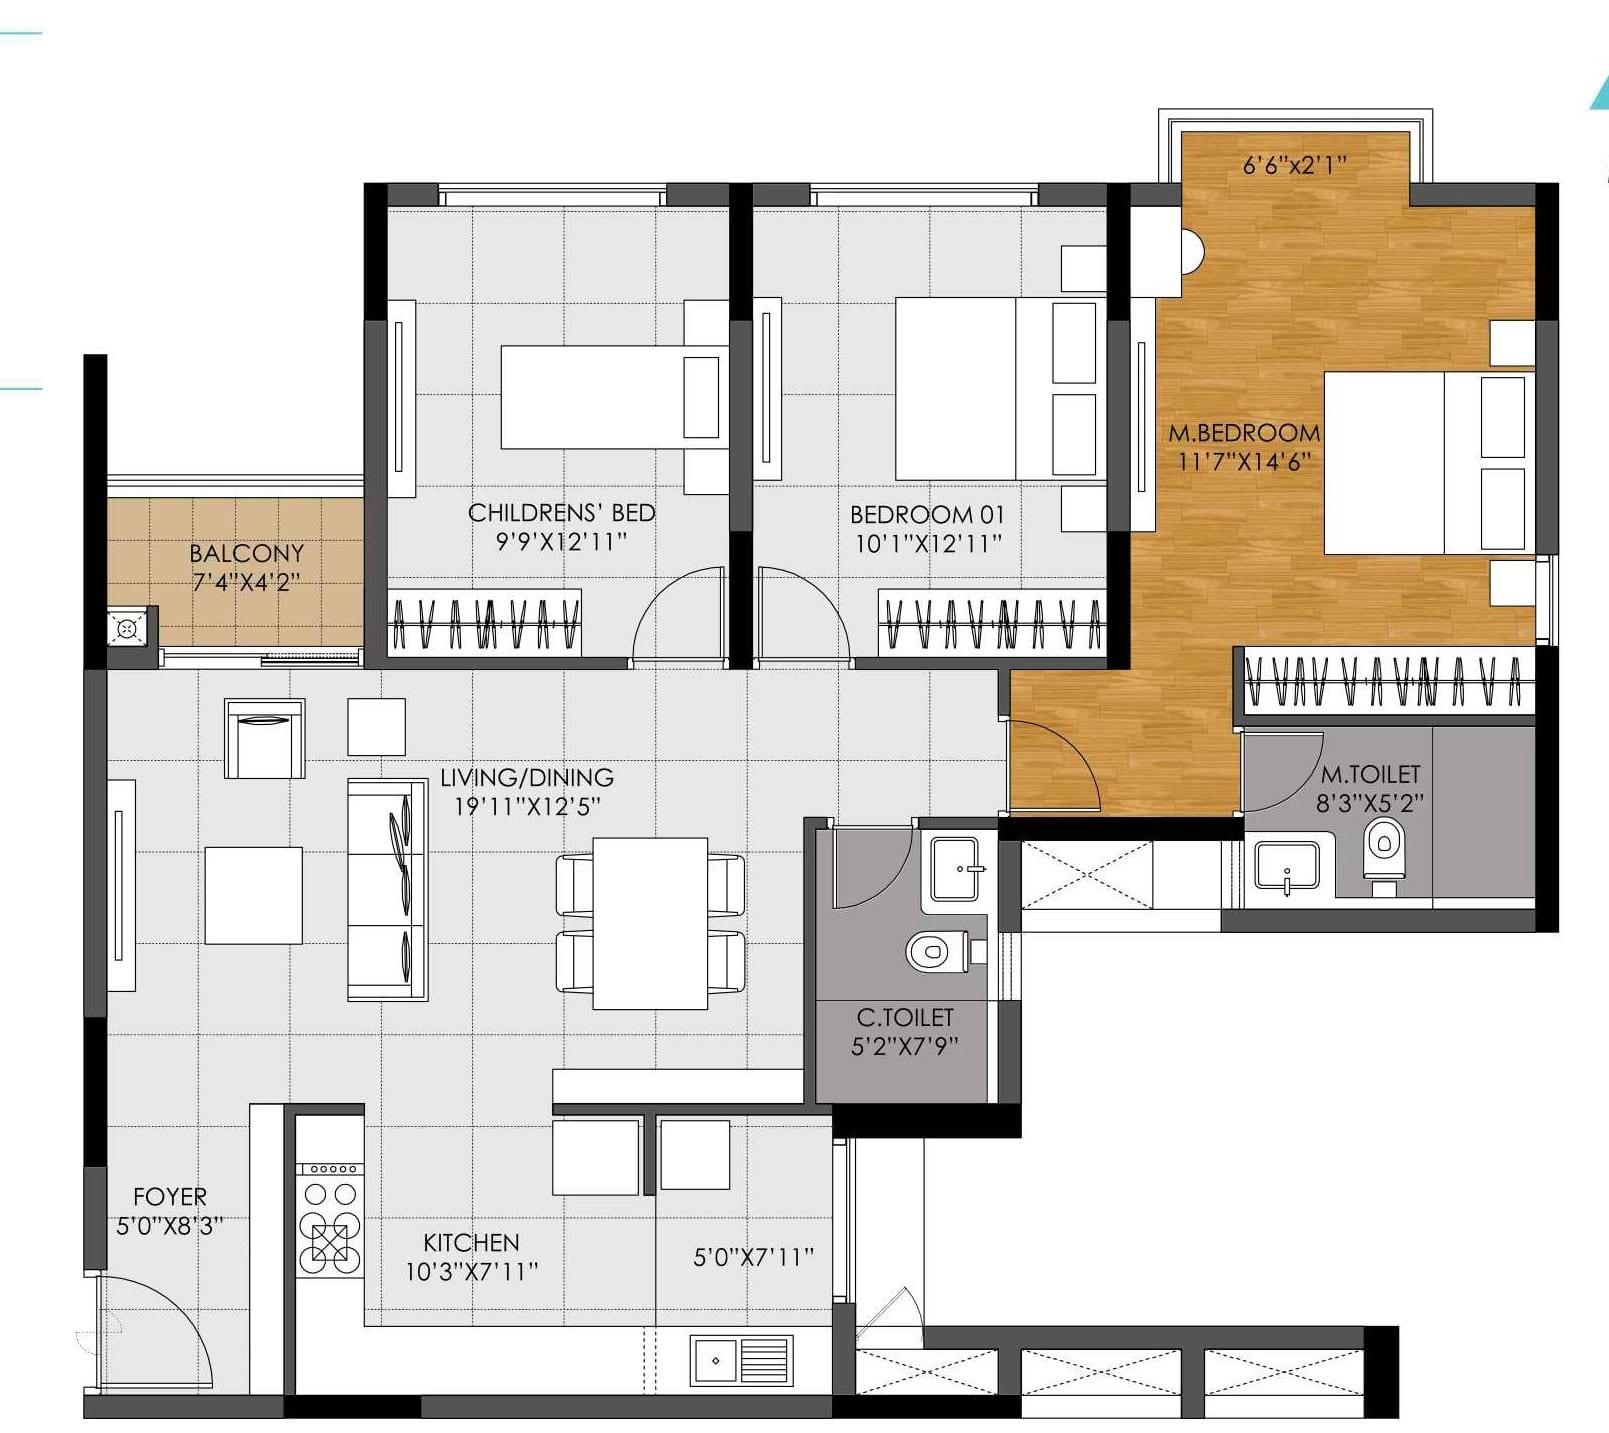 DNR-Casablanca-3bhk-1494-sqft-floorplan